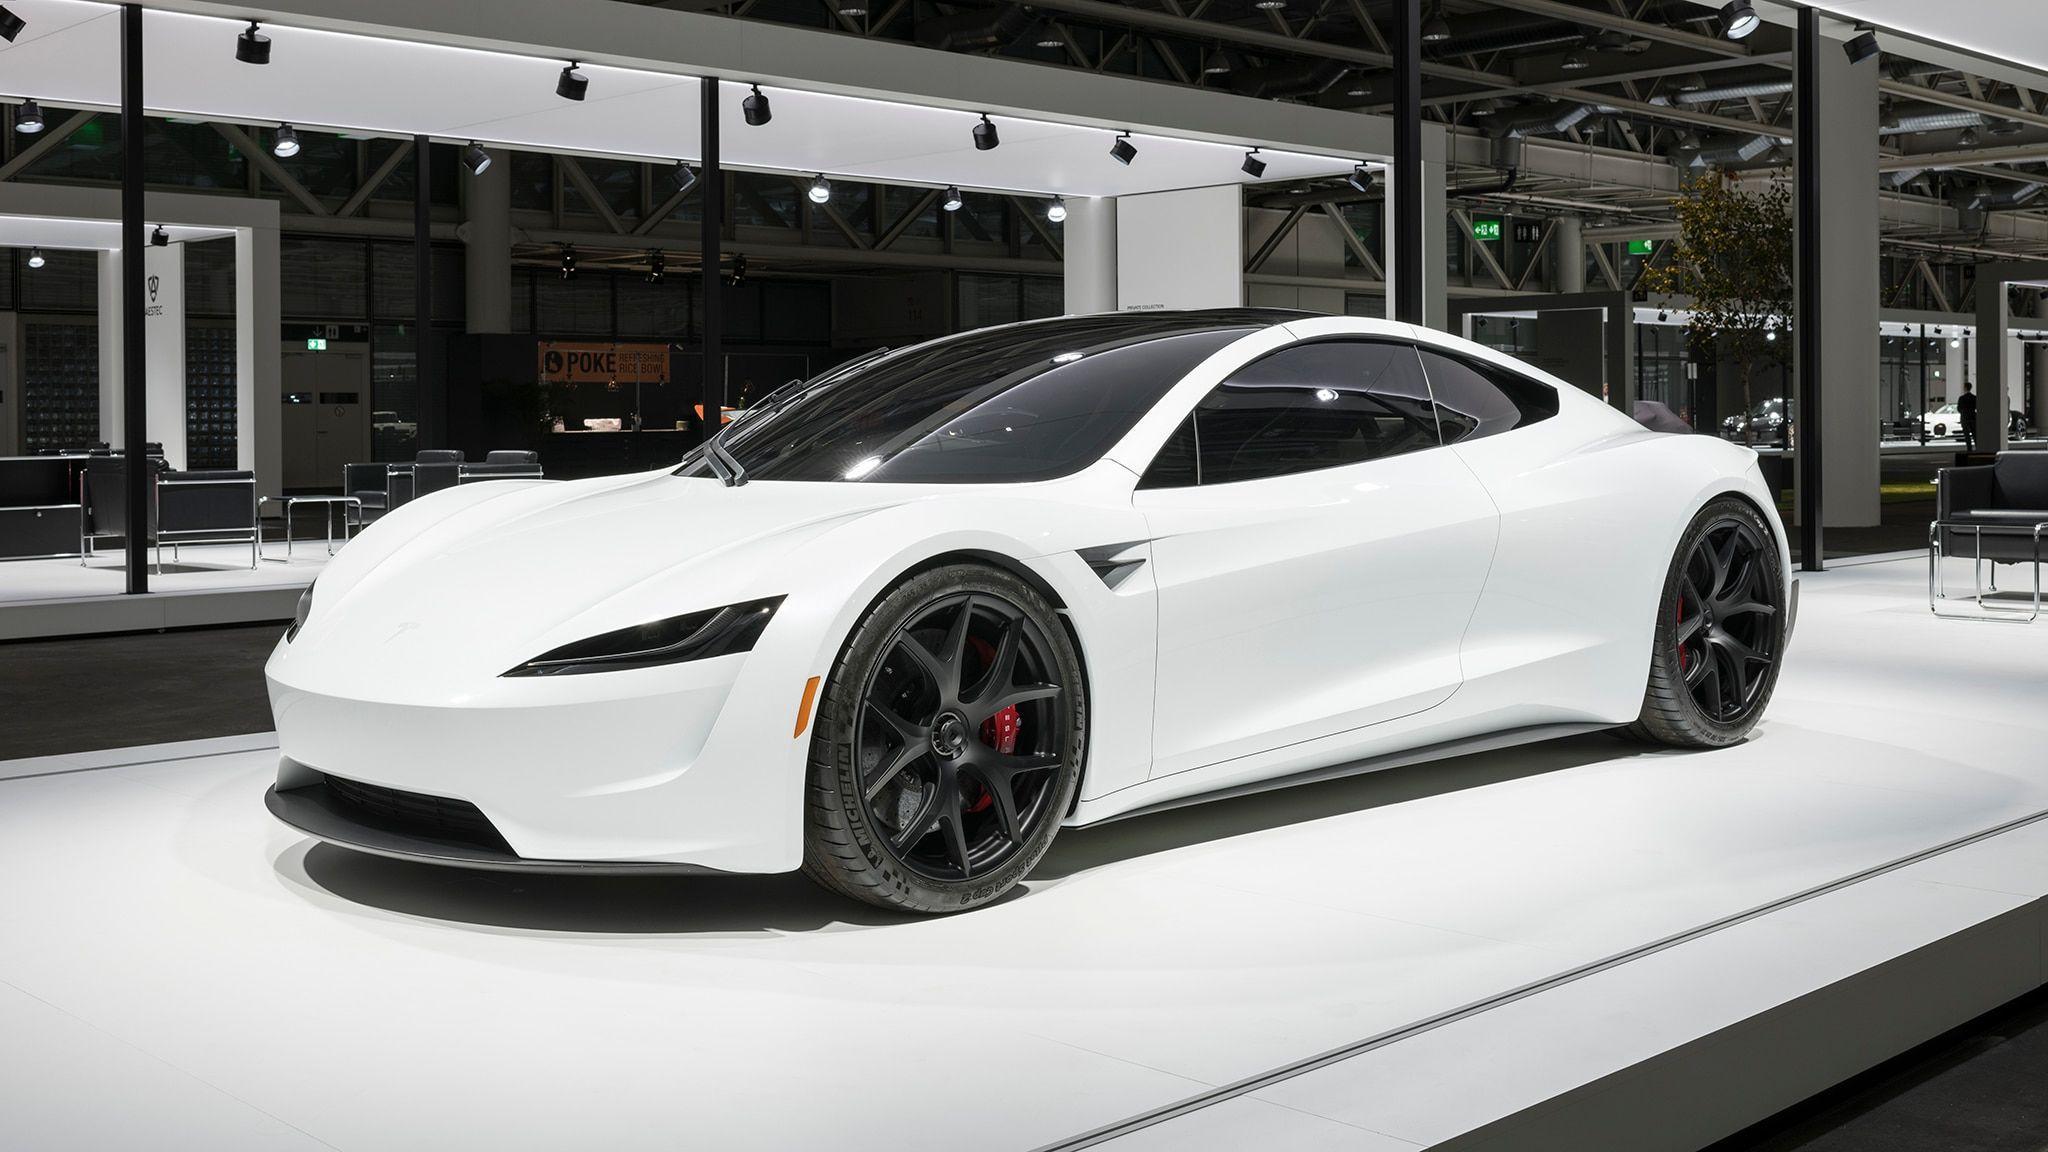 Tesla Roadster 2020 Wallpapers Top Free Tesla Roadster 2020 Backgrounds Wallpaperaccess